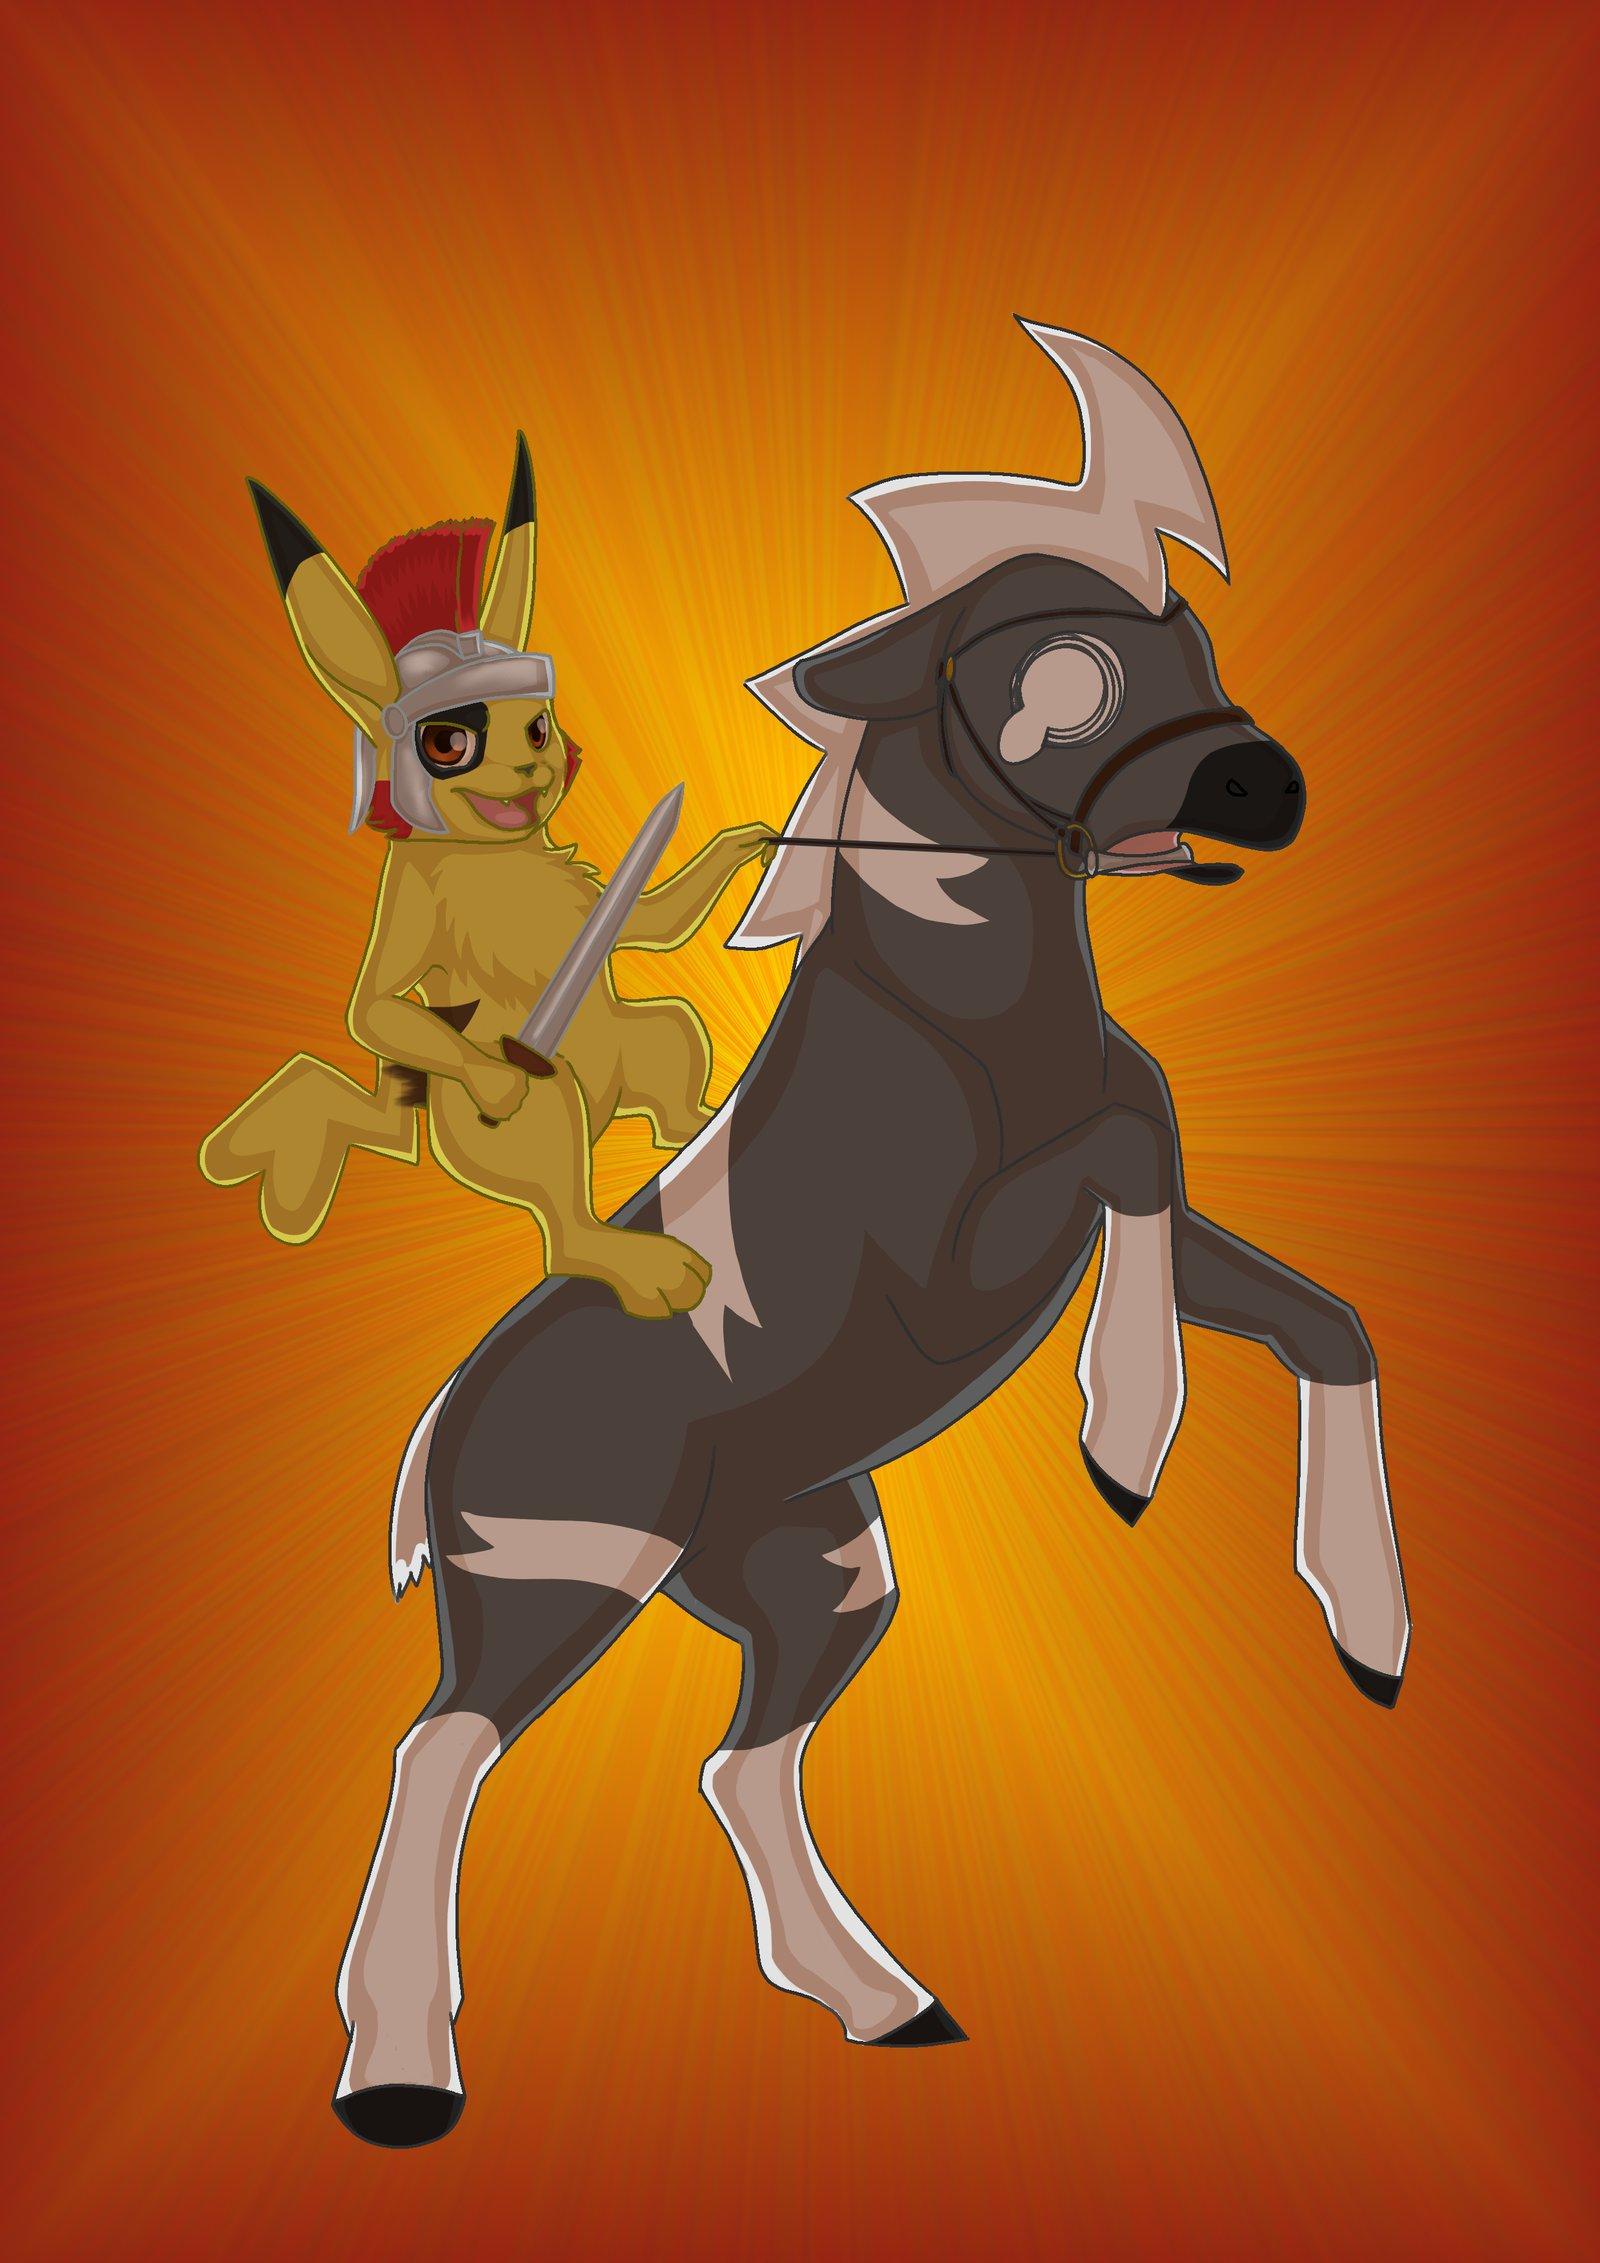 Onward, my trusty steed! by IndigoBlackbird on DeviantArt